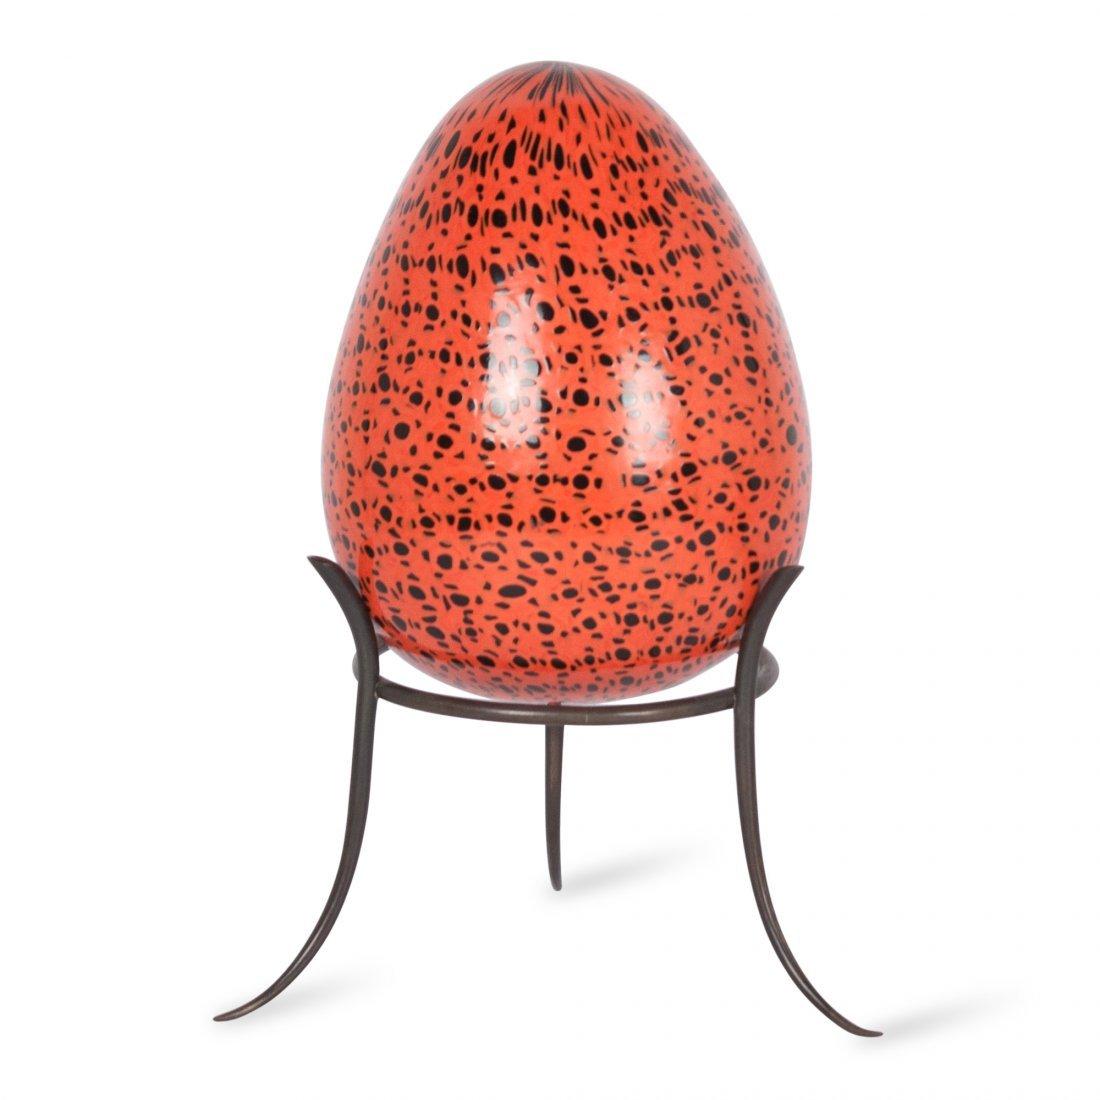 Santillana for Venini Glass Egg